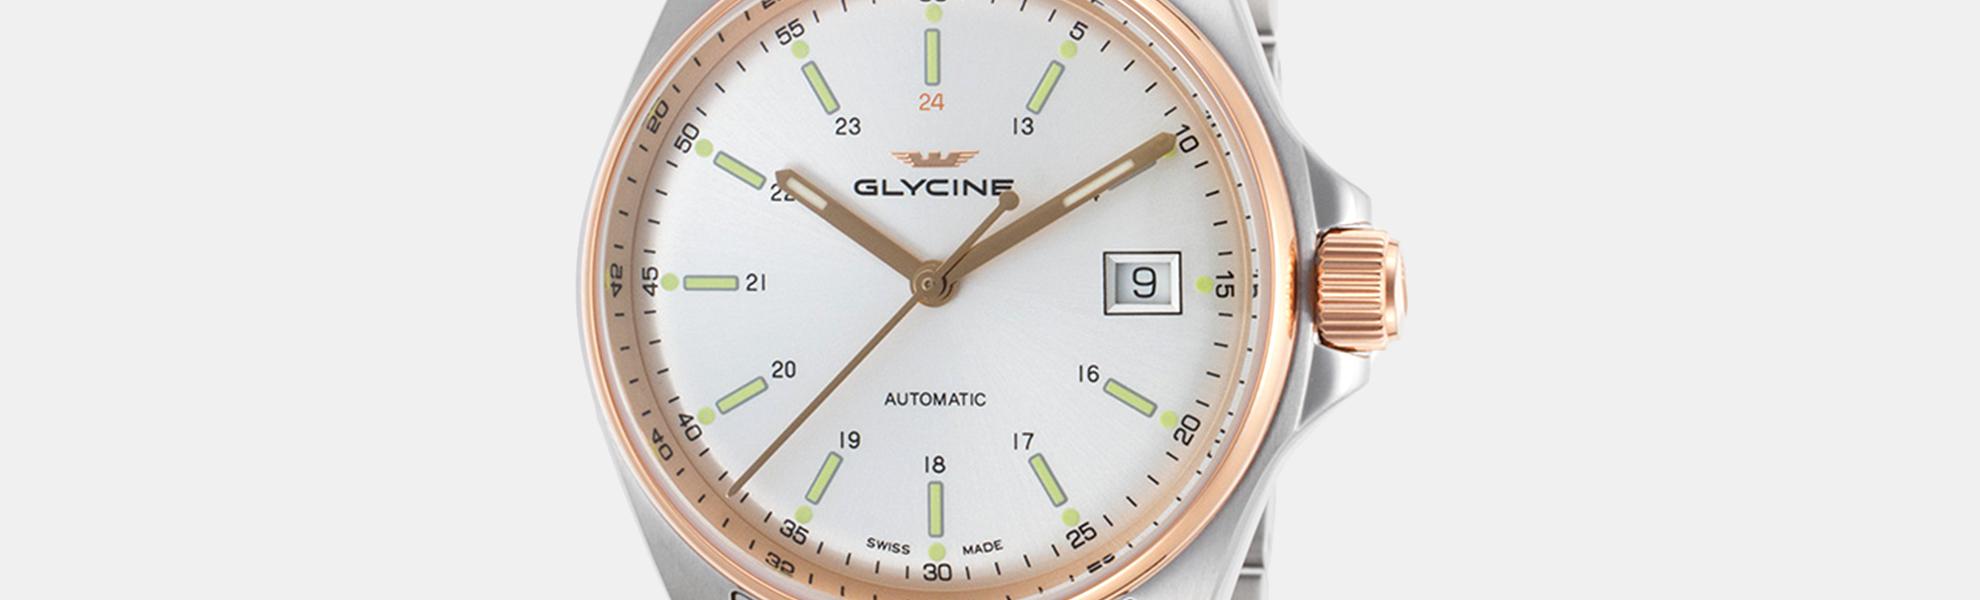 Glycine Combat 6 36mm Automatic Watch-$280 at Massdrop